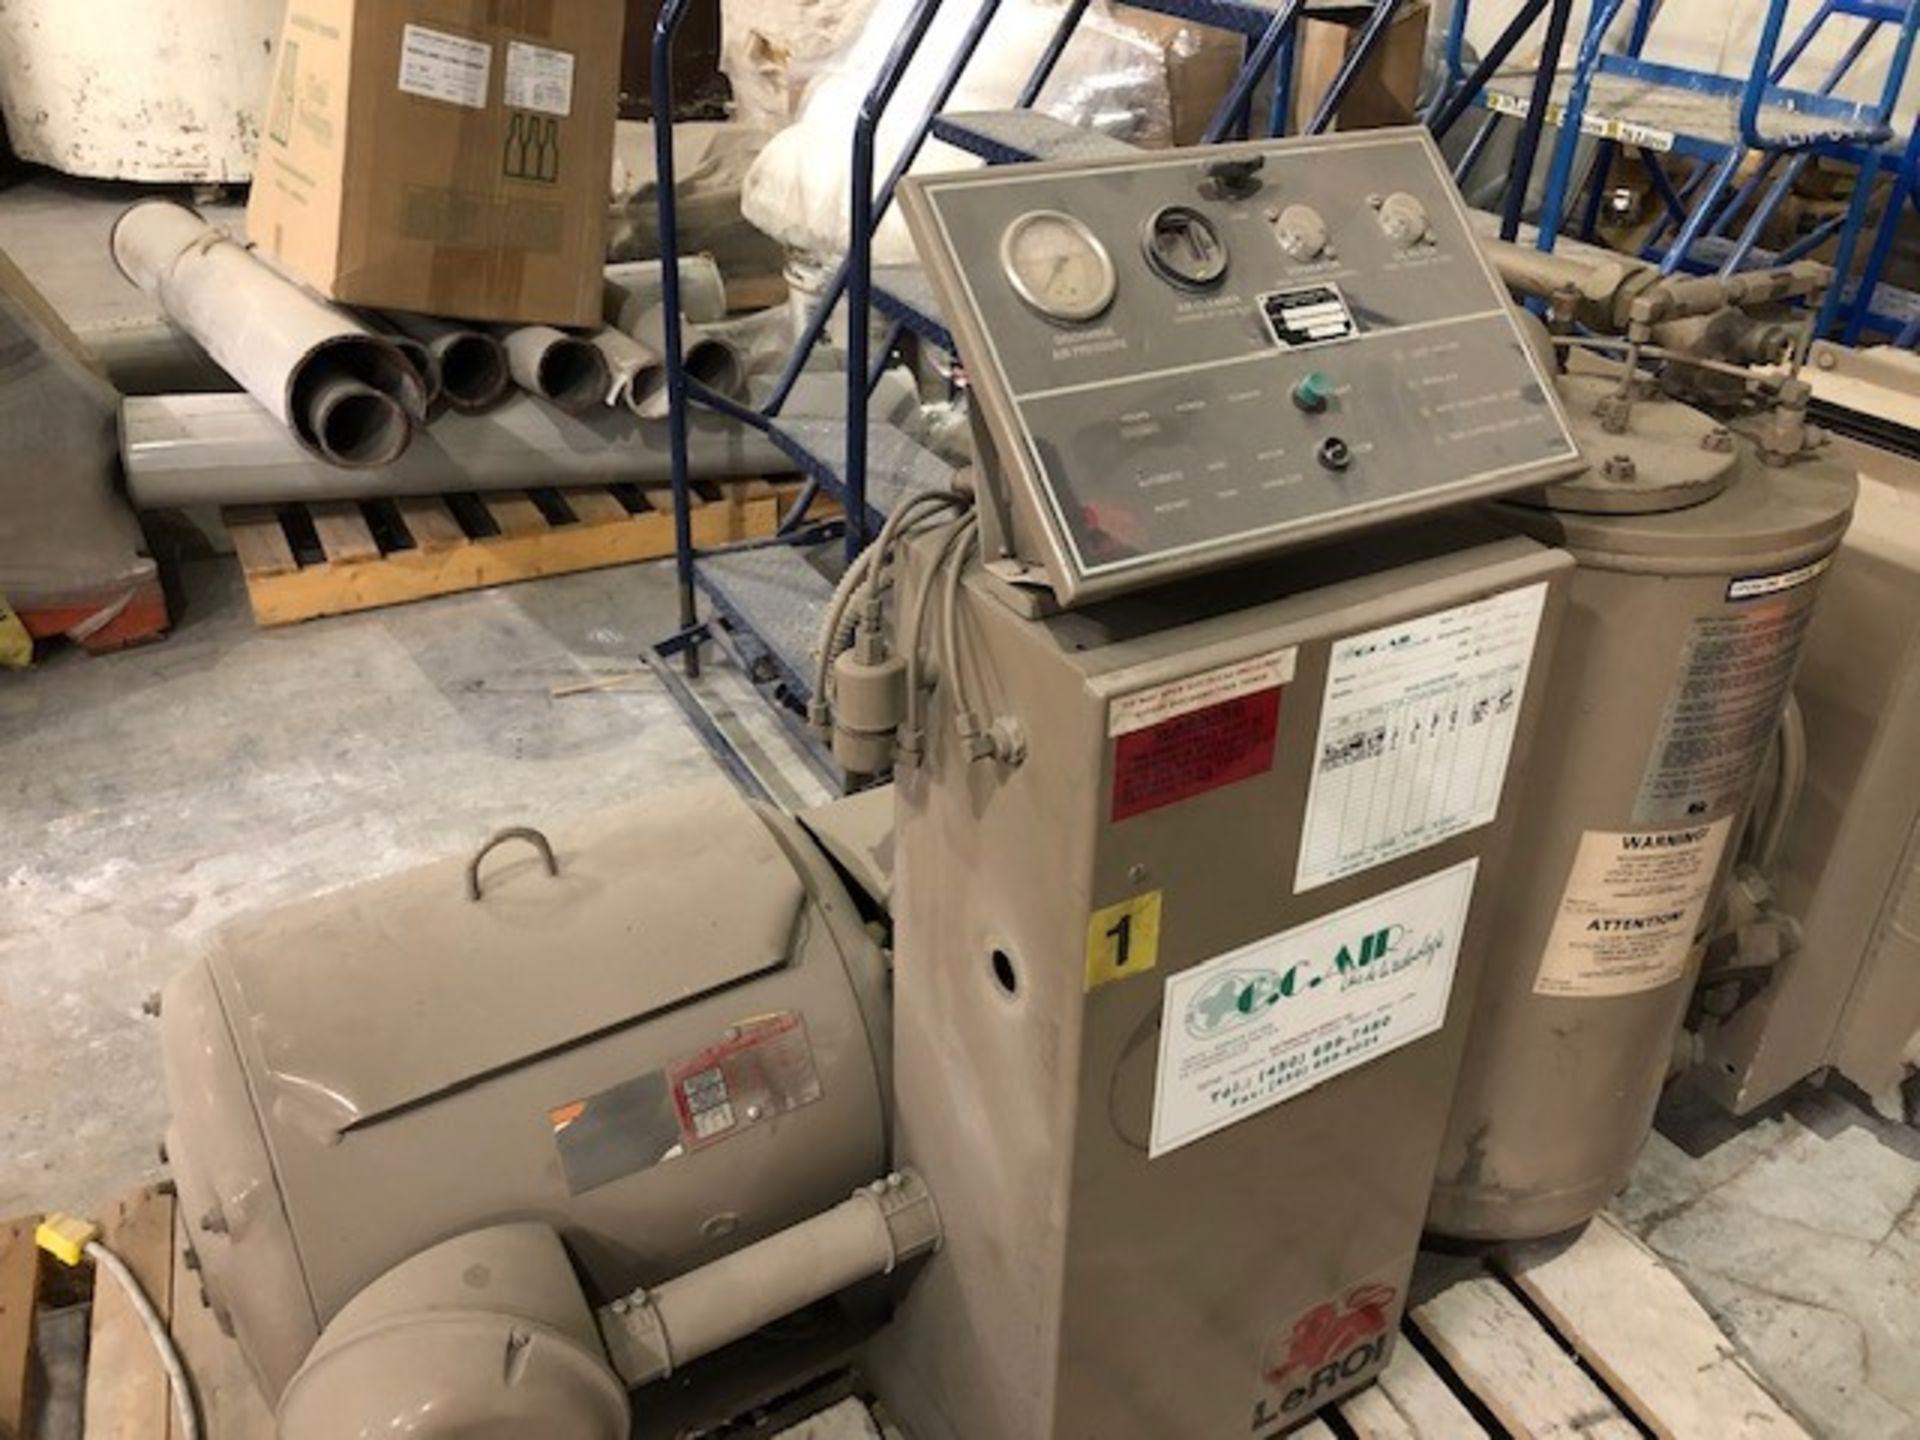 Air Compressor 50hp #2 LeRoi International model: A219-180 G8, s/n: 4166X2457, 125psi, 50hp 600v